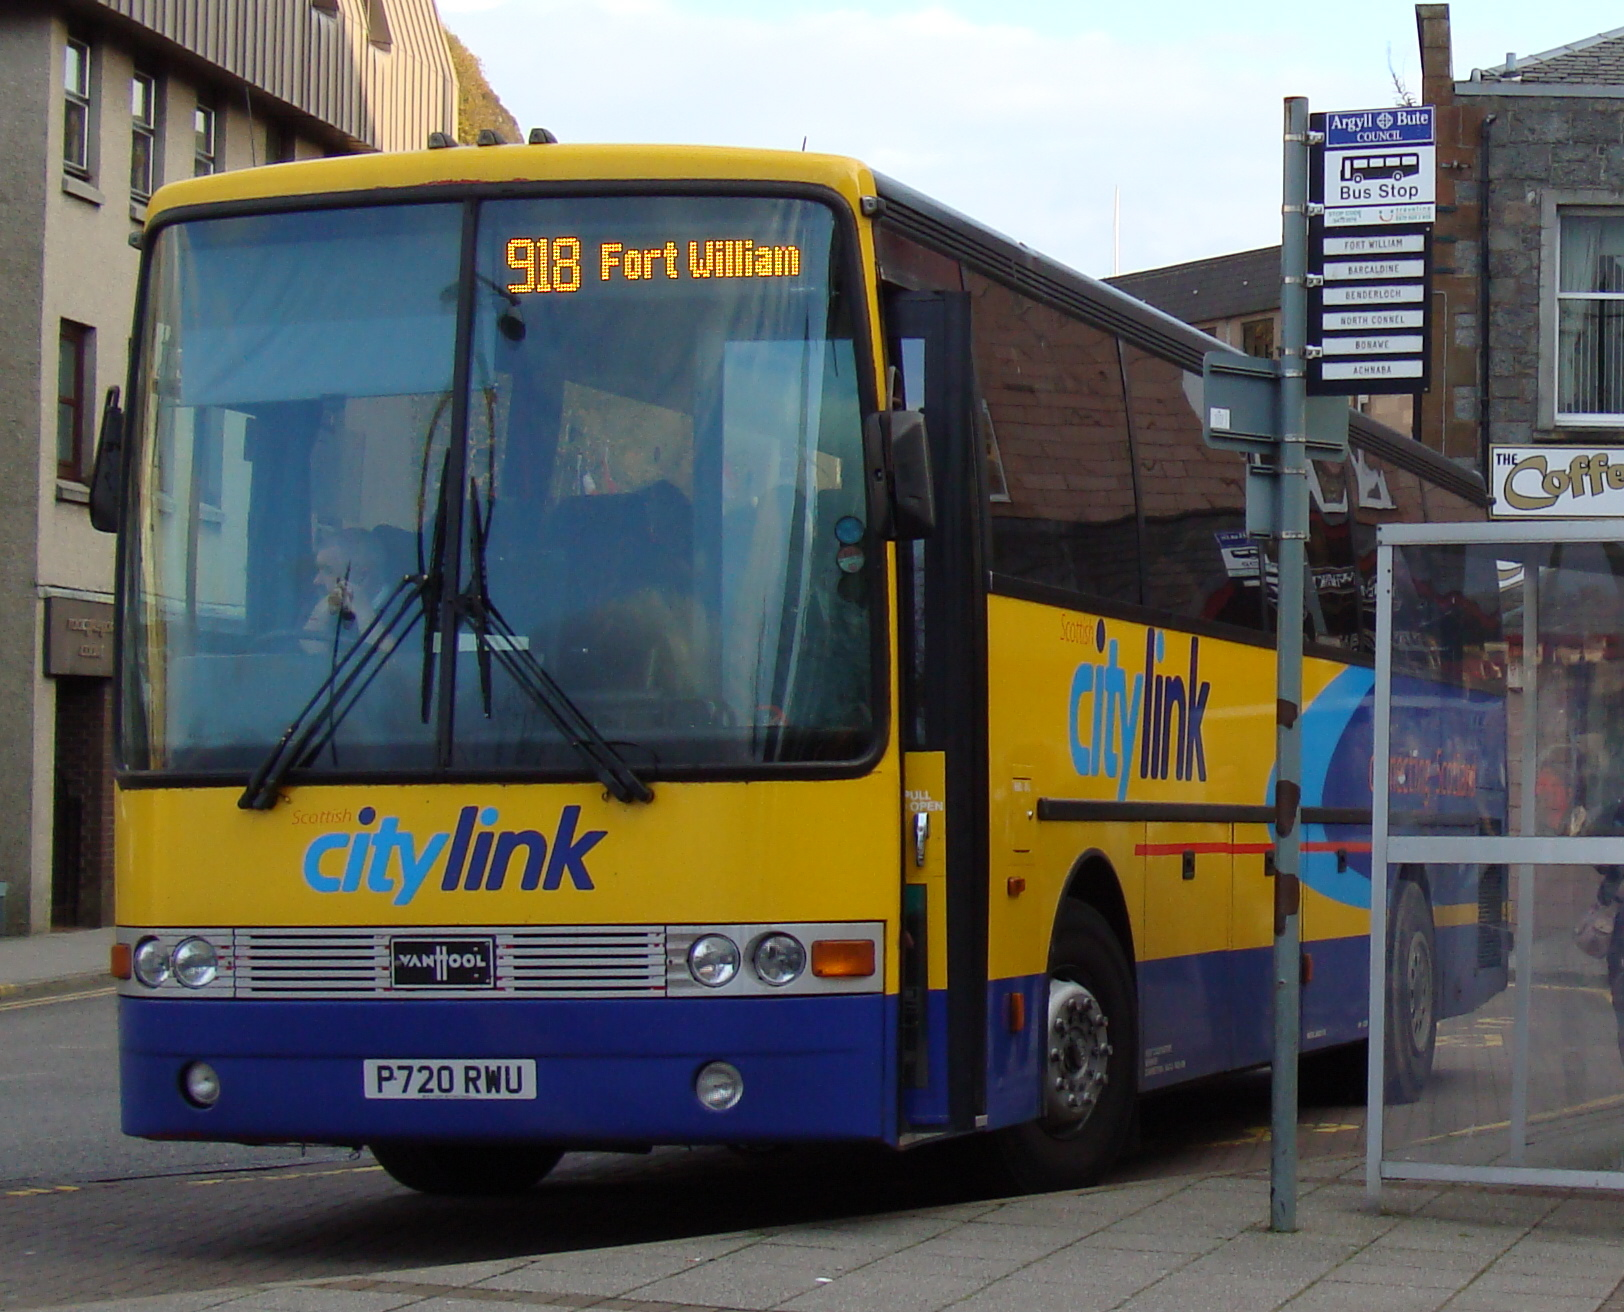 File Scottish Citylink Coach P720 Rwu 1996 Daf Sb3000